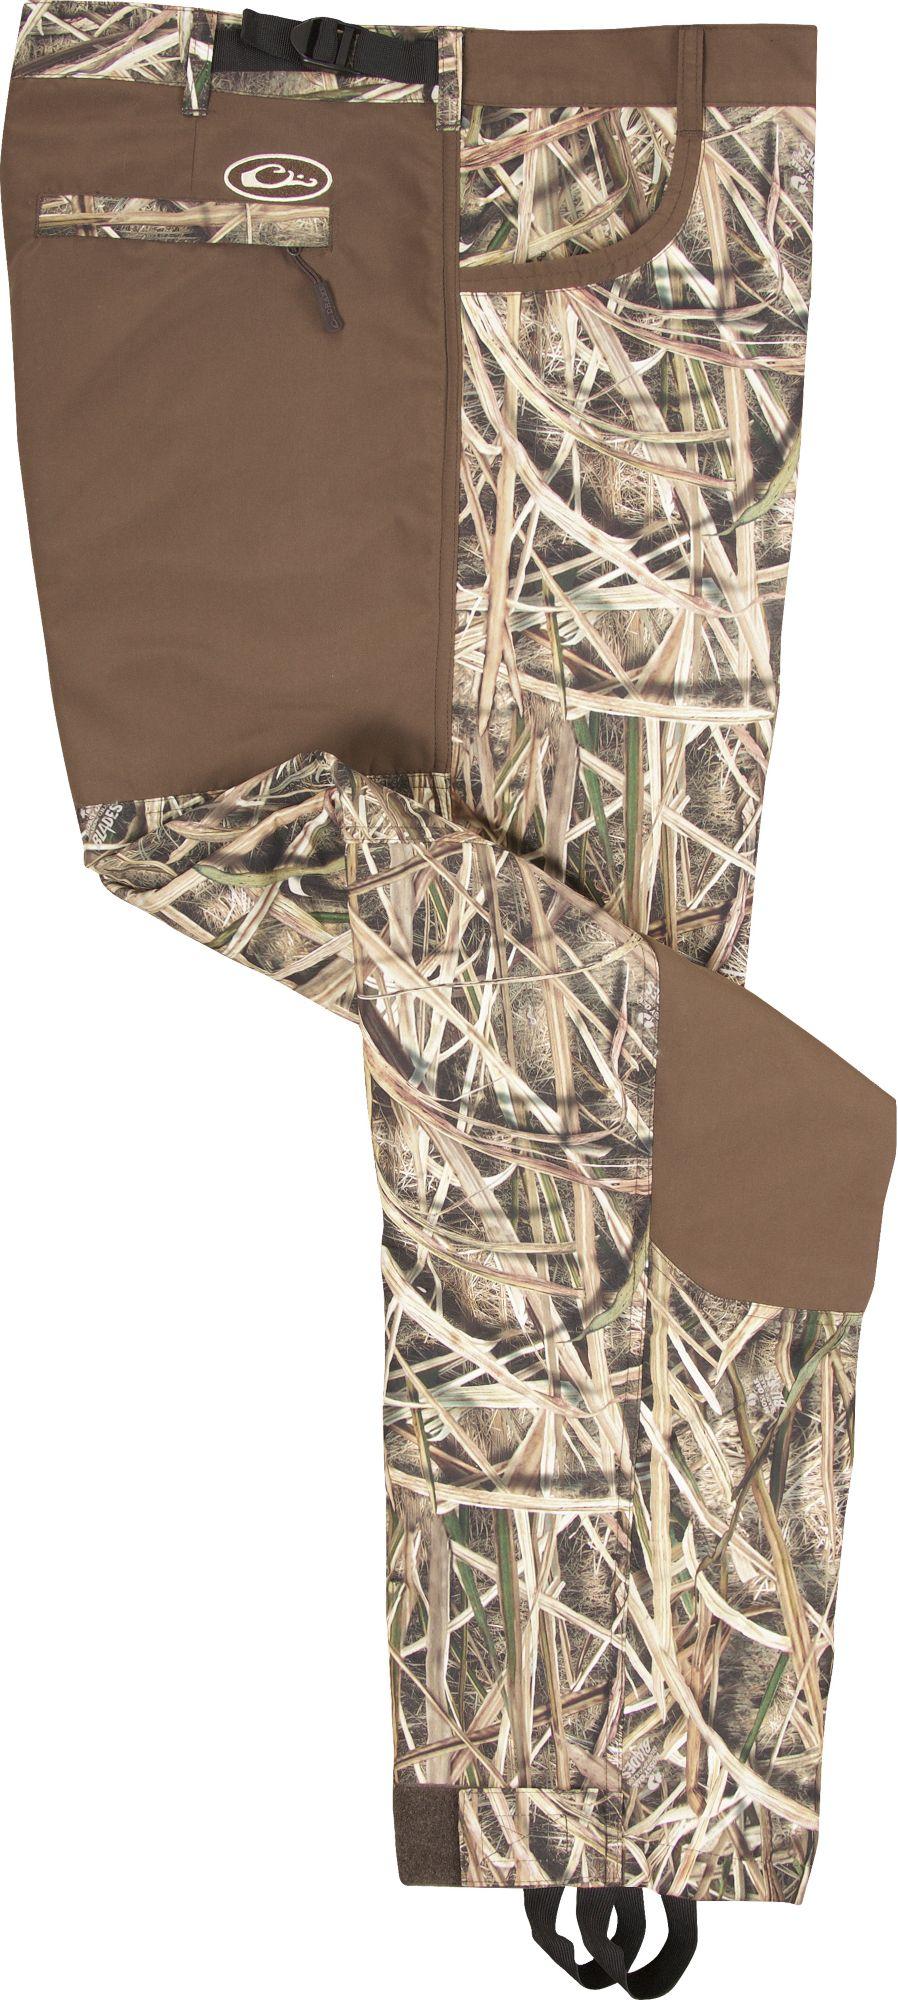 Drake Waterfowl Men's MST Jean Cut Under-Wader Pants 2.0, Size: XL, Brown thumbnail